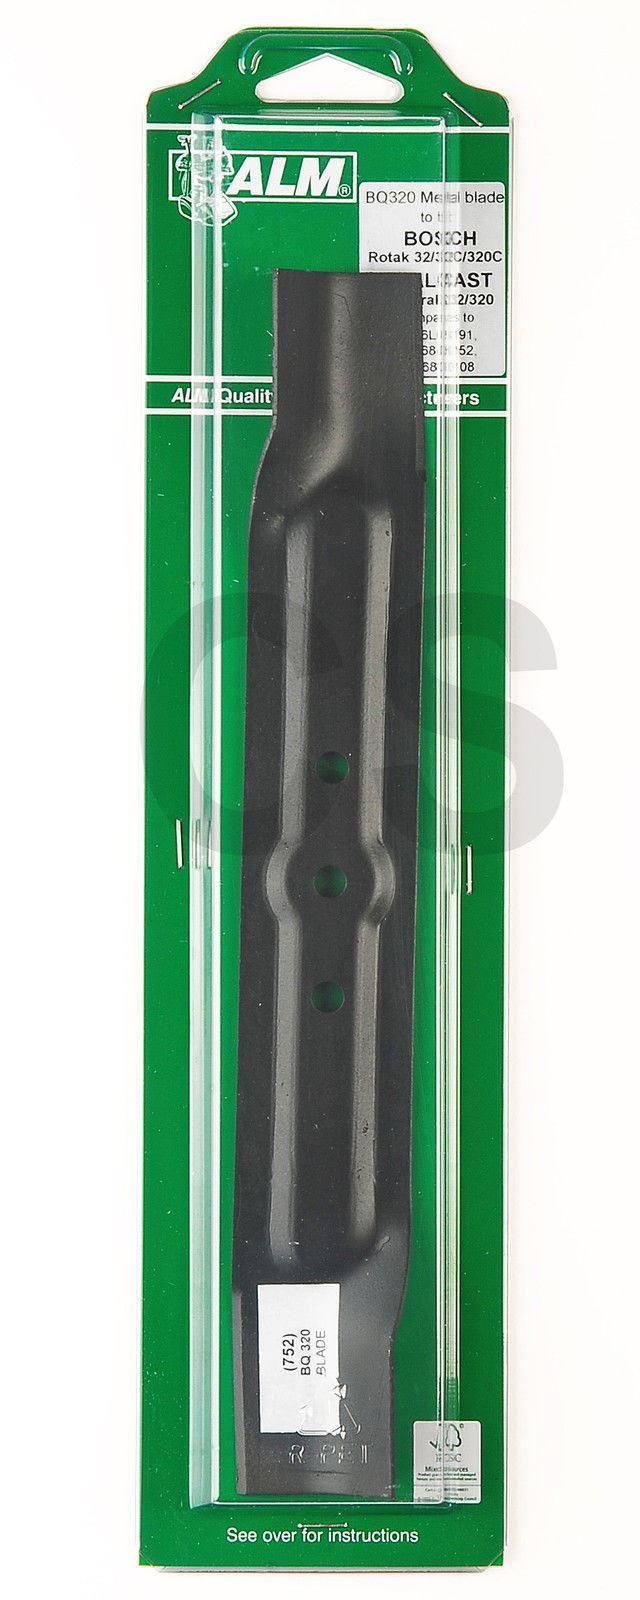 alm qualcast easi trak 32 320 bosch rotak 32 320 320c metal blade 32cm bq320 ebay. Black Bedroom Furniture Sets. Home Design Ideas